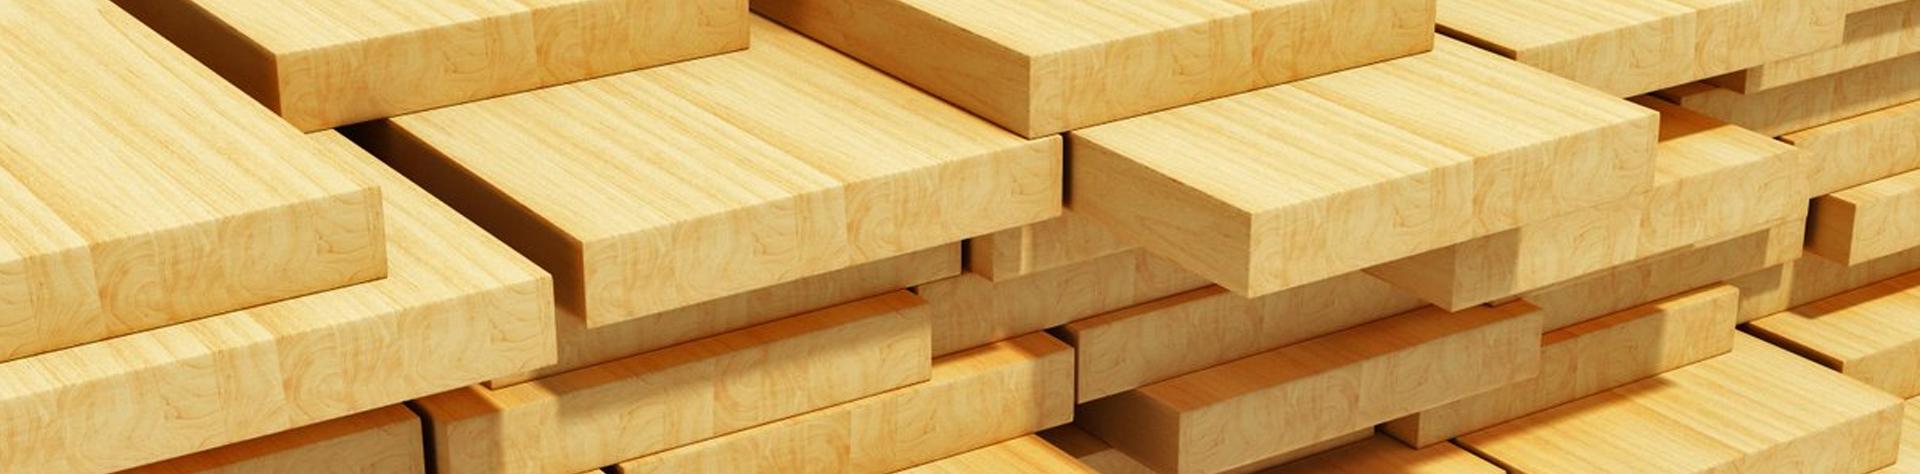 Burma Teak Wood Timber Suppliers Burma Teak Wood Timber